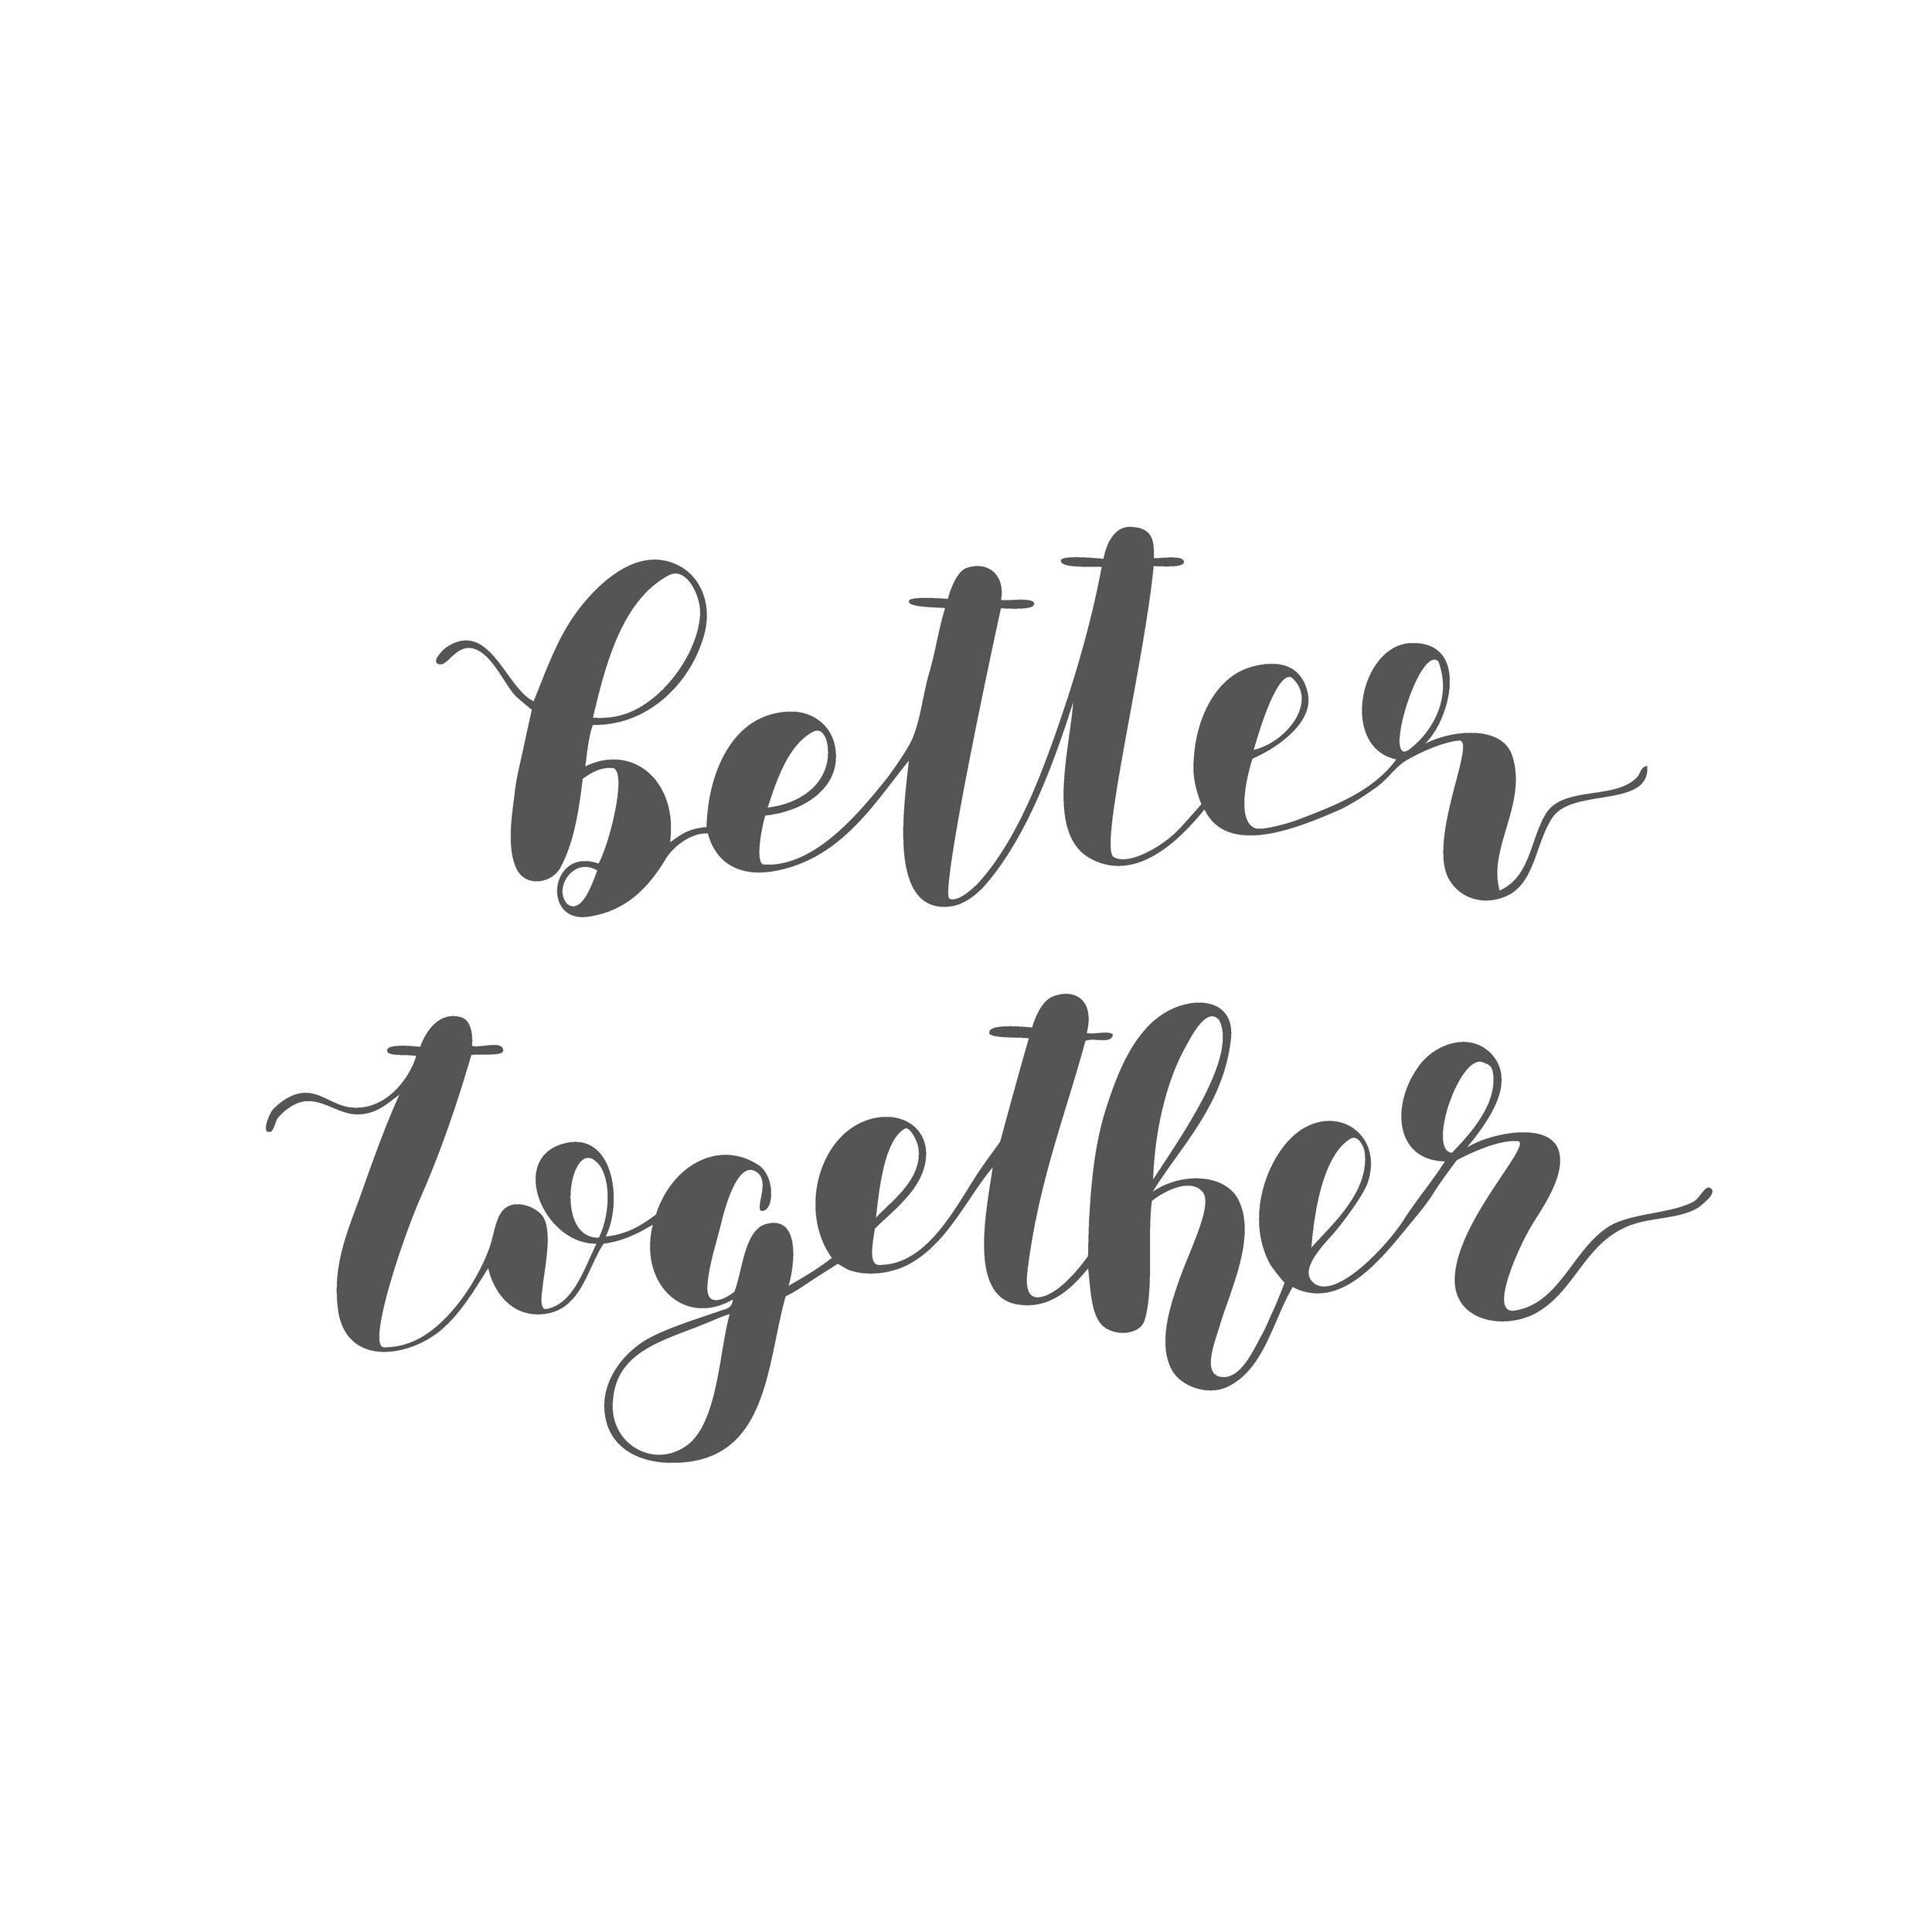 Better together. Brush lettering.